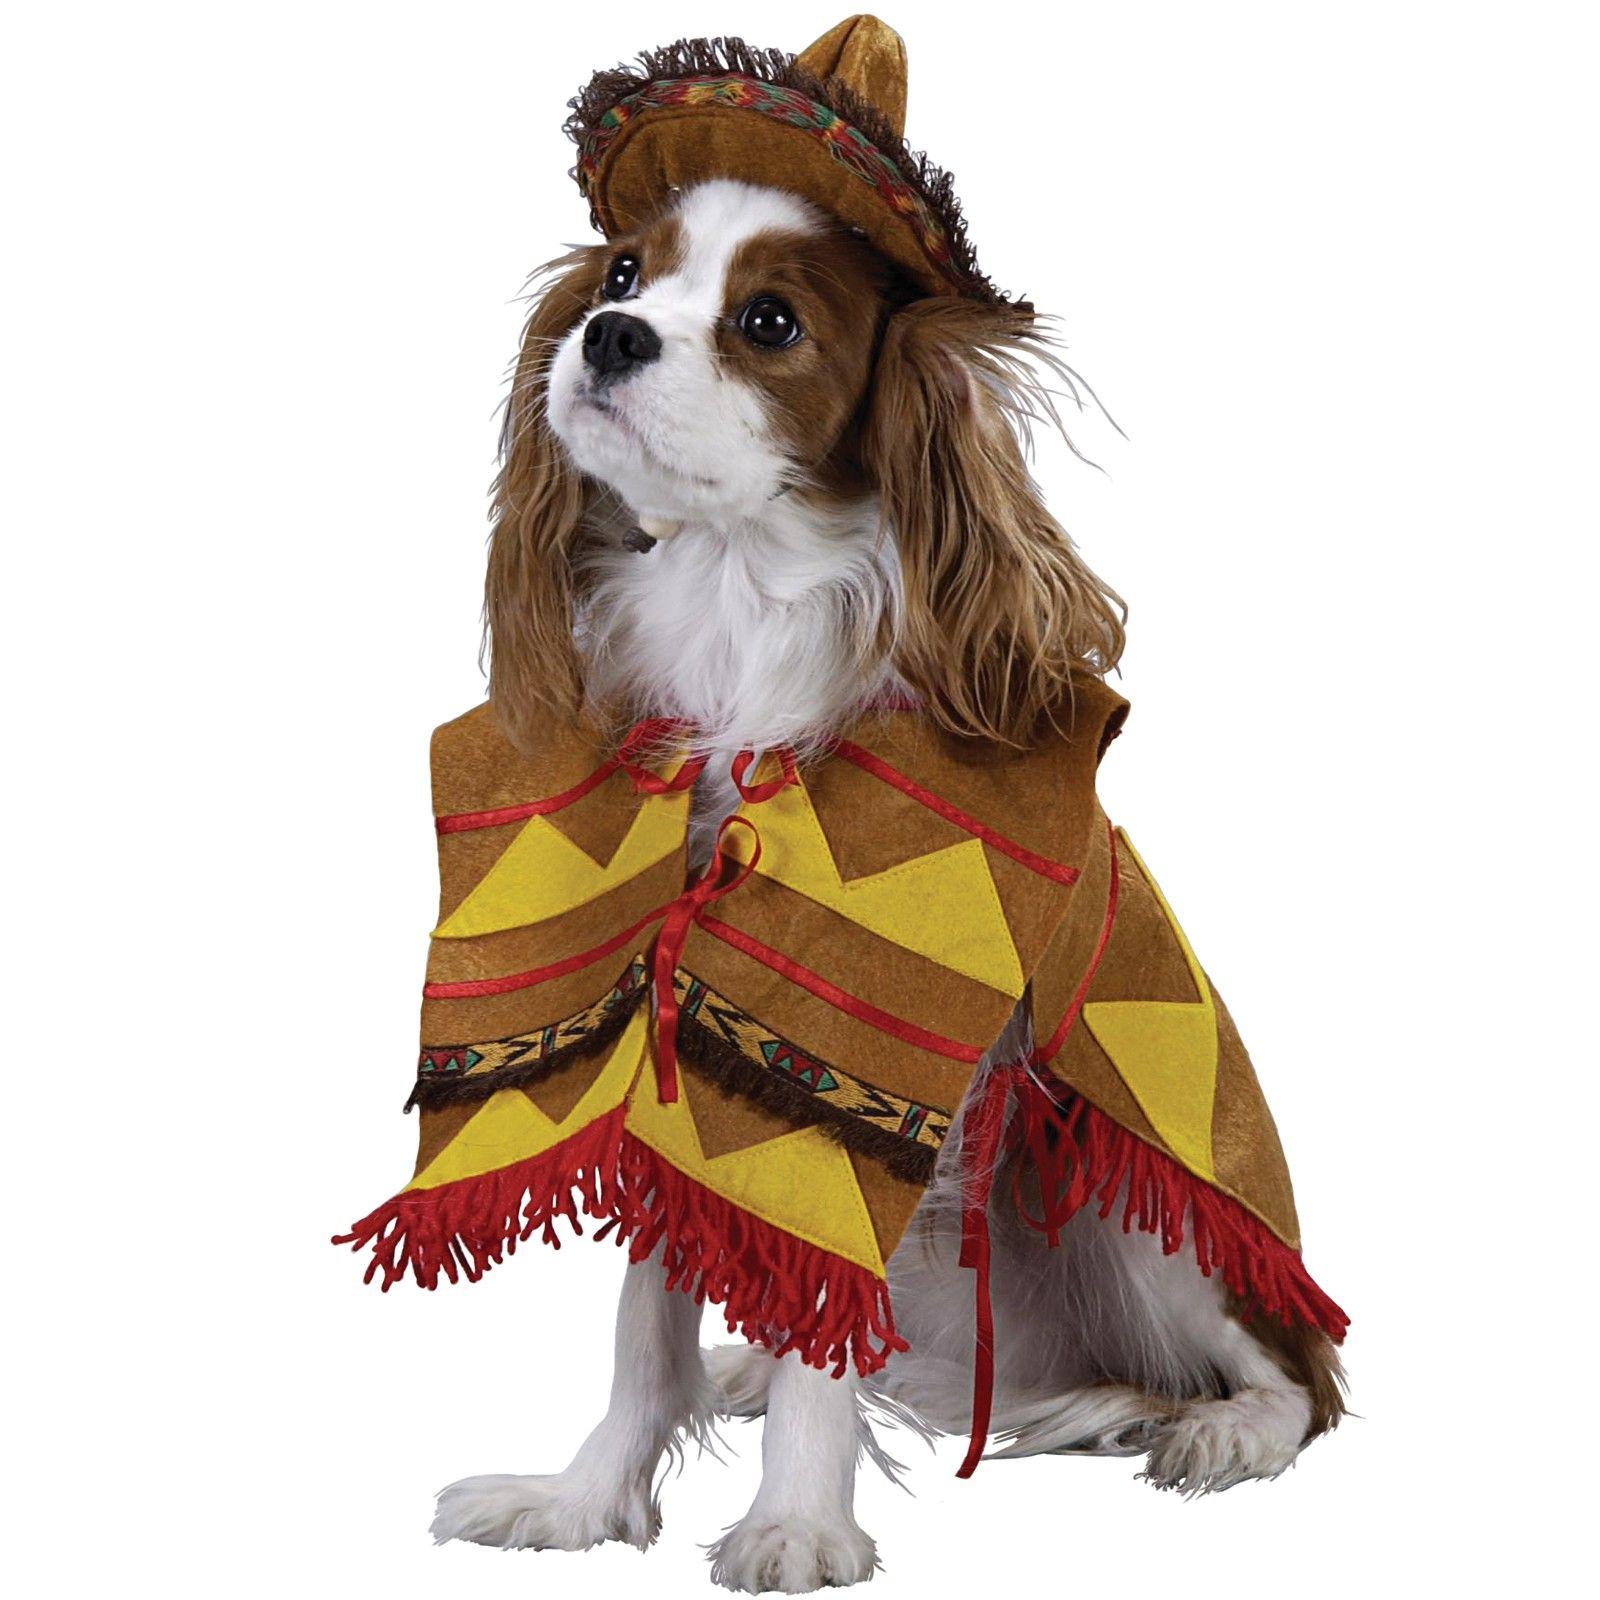 Pet Costume Lil Bandito Pet Costumes Dog Halloween Costumes